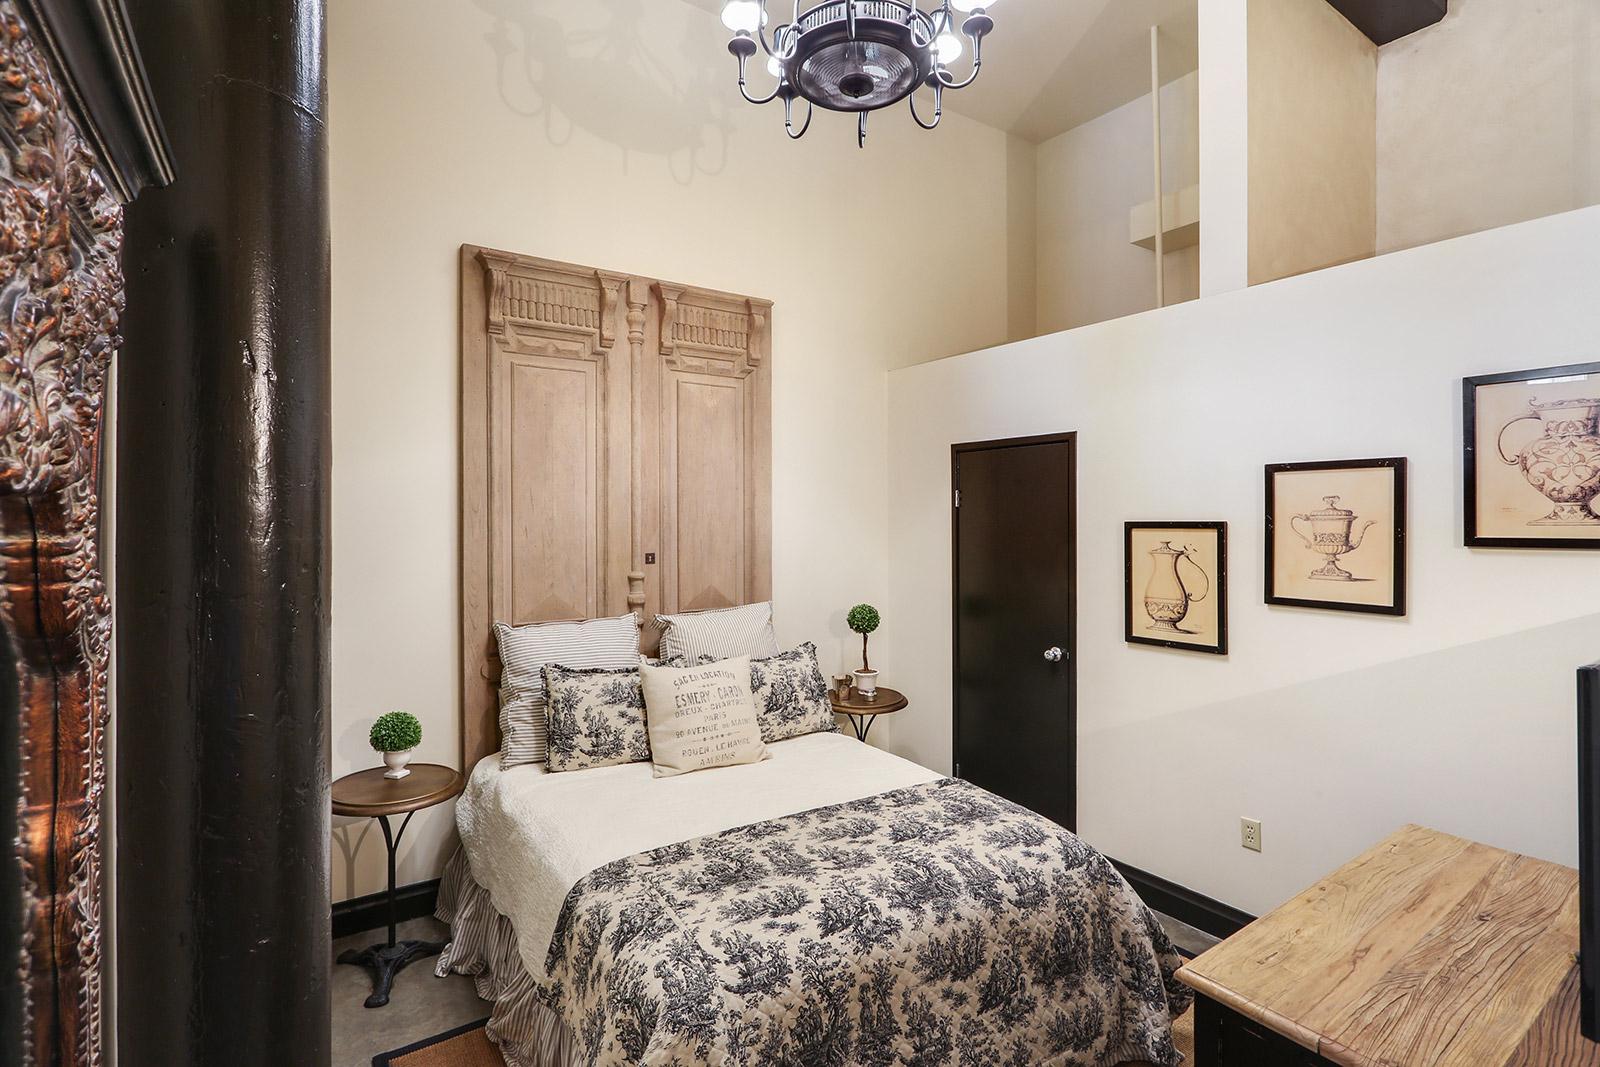 CBD/Warehouse District/South Market, Condo, 1 beds, 1.0 baths, $2400 per month New Orleans Rental - devie image_3